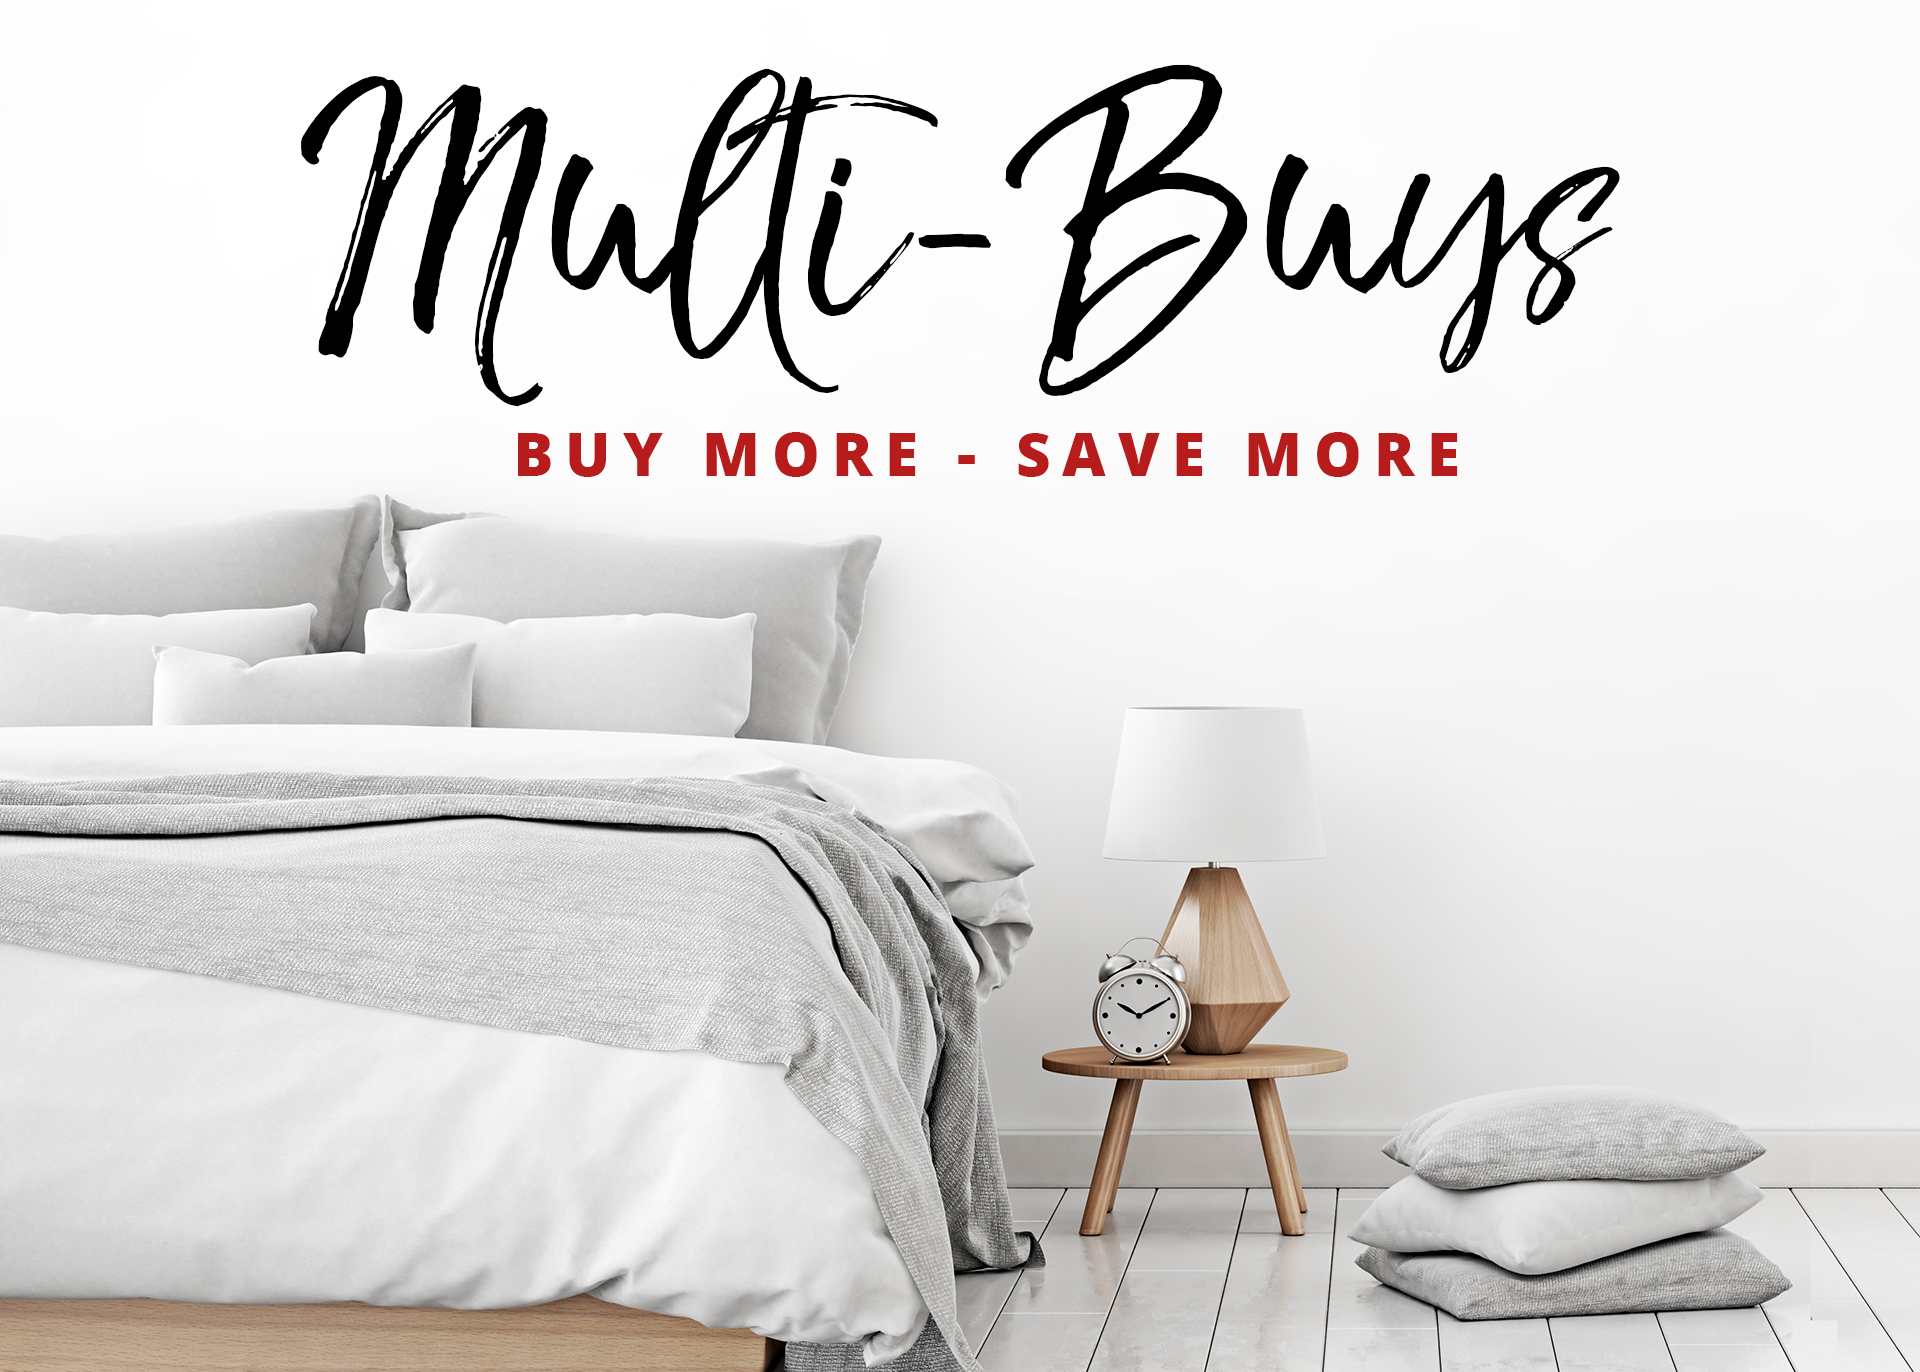 multi-buys-banner-xl-001.jpg